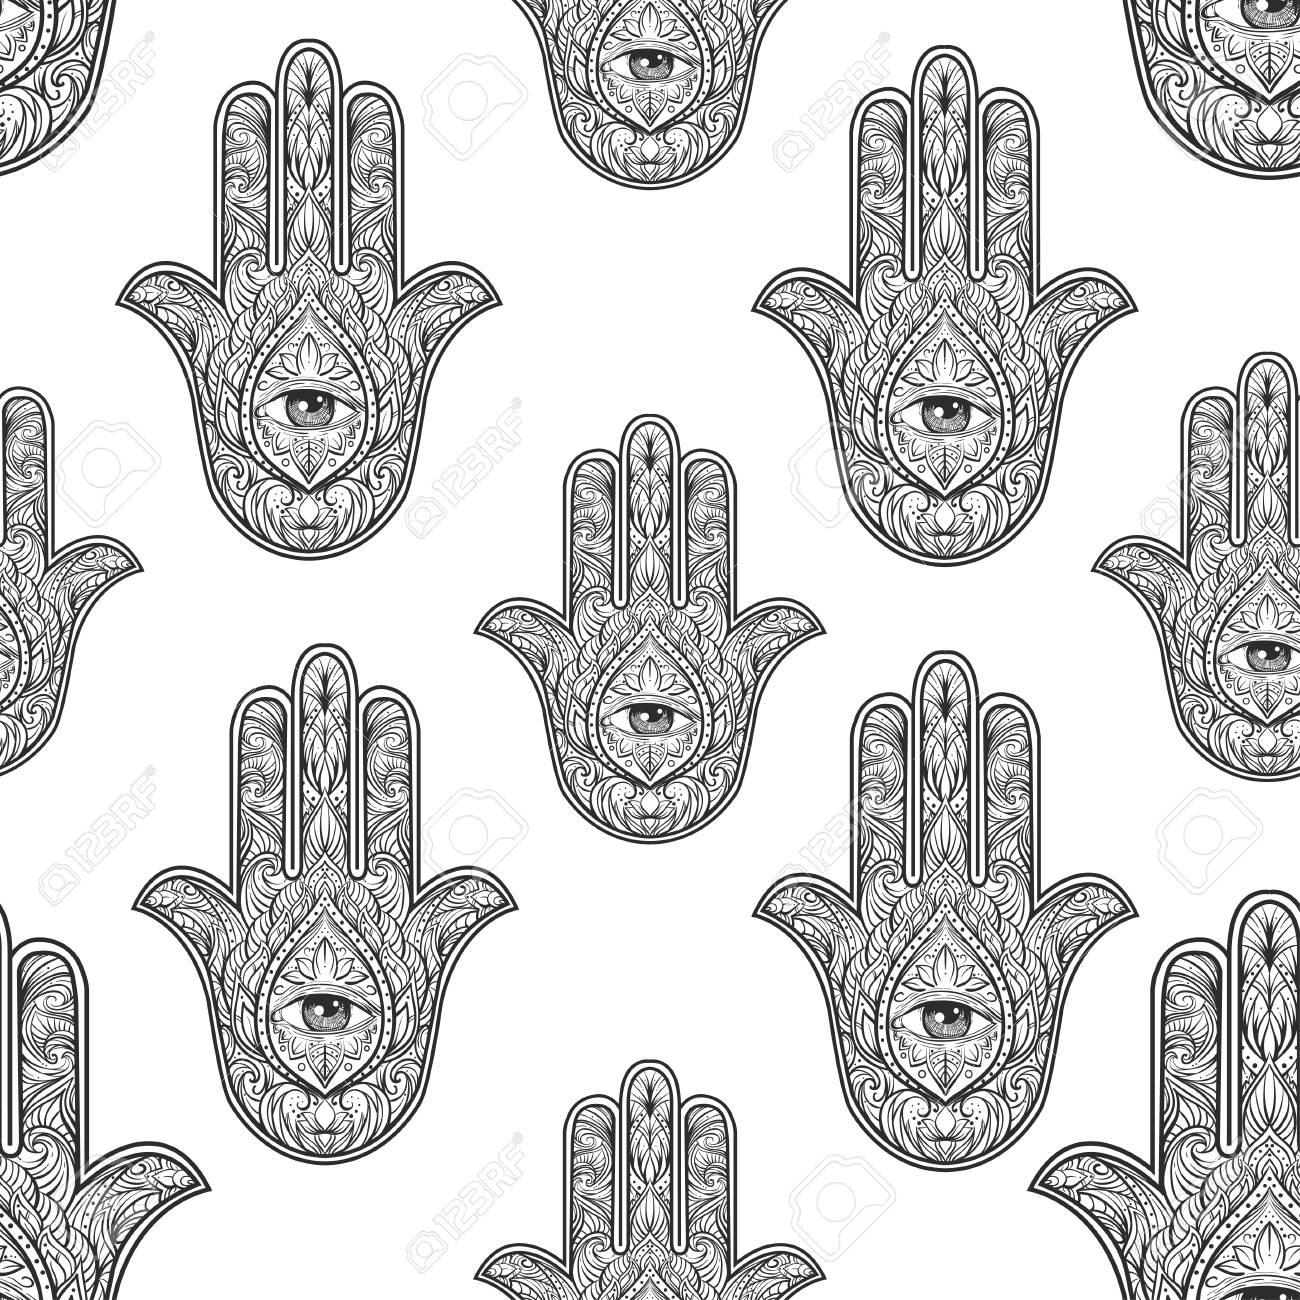 Hamsa Hand Pattern Vector Illustration Drawn Symbol Of Protection For Adult Anti Stress